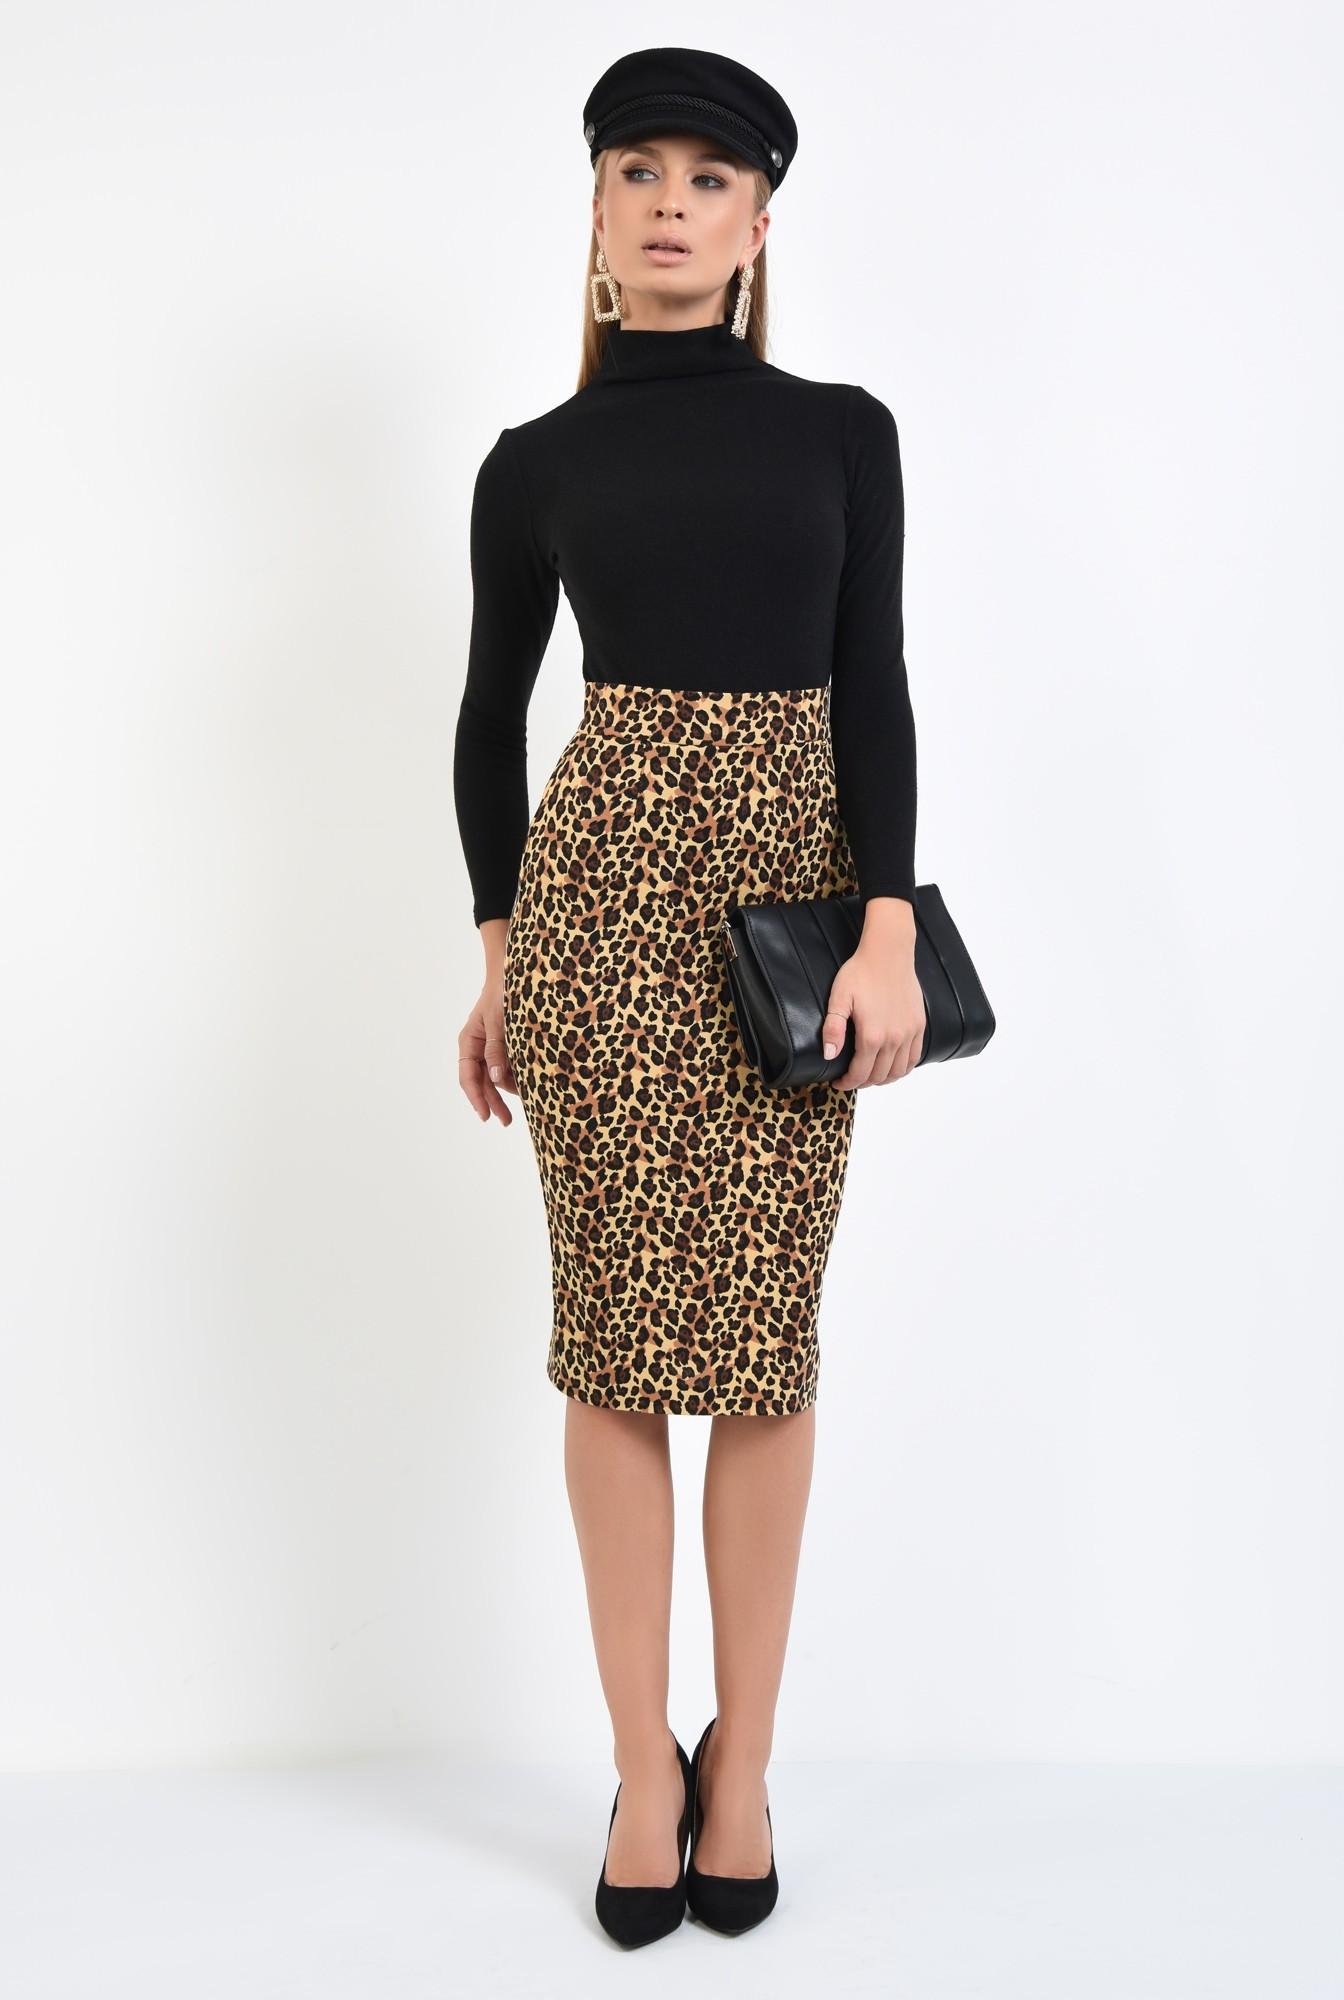 3 - fusta cu imprimeu leopard, midi, tesatura elastica